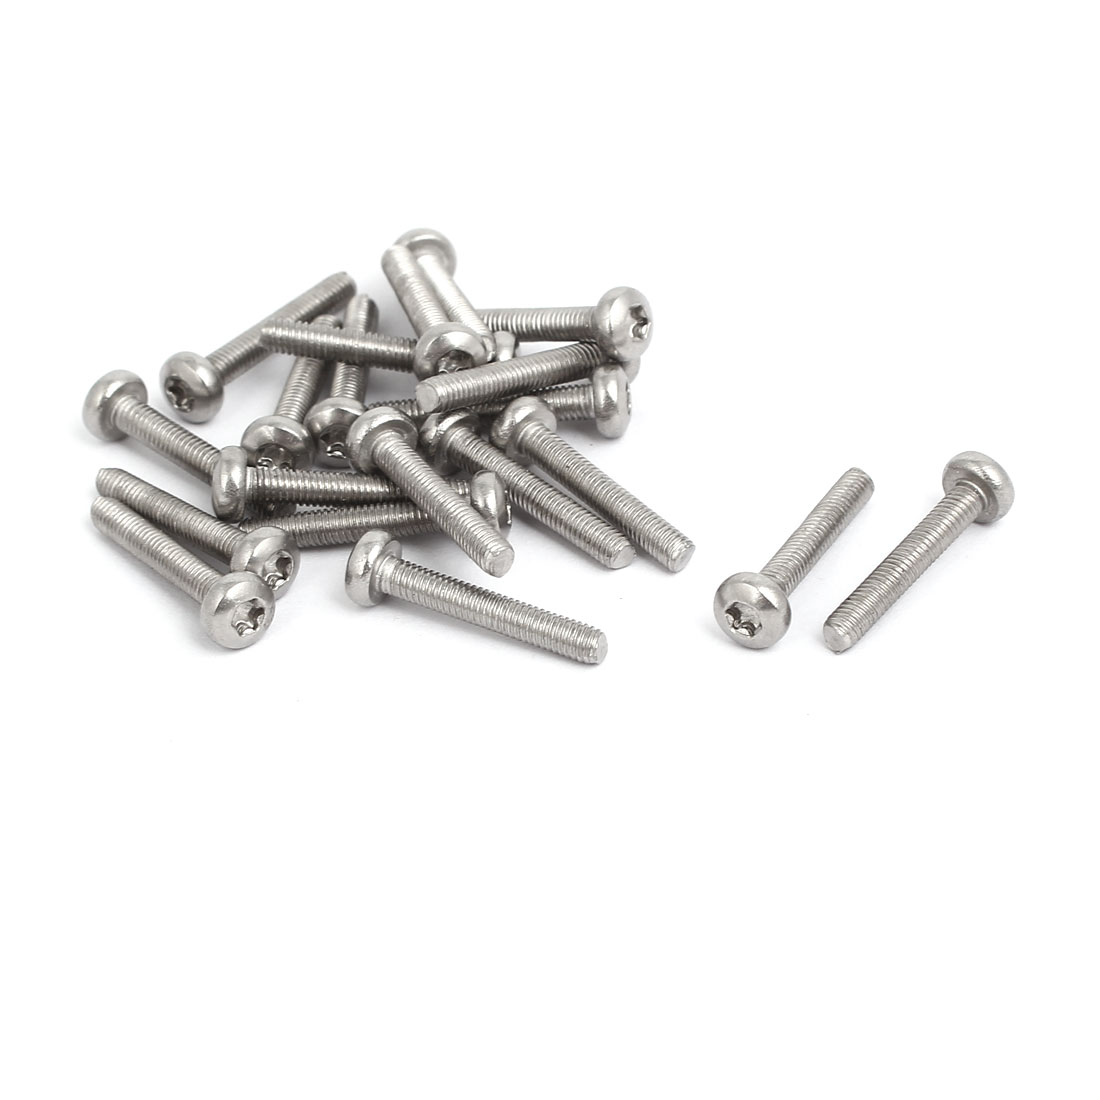 M3x18mm 304 Stainless Steel Button Head Torx Screws Bolts T10 Drive 20pcs